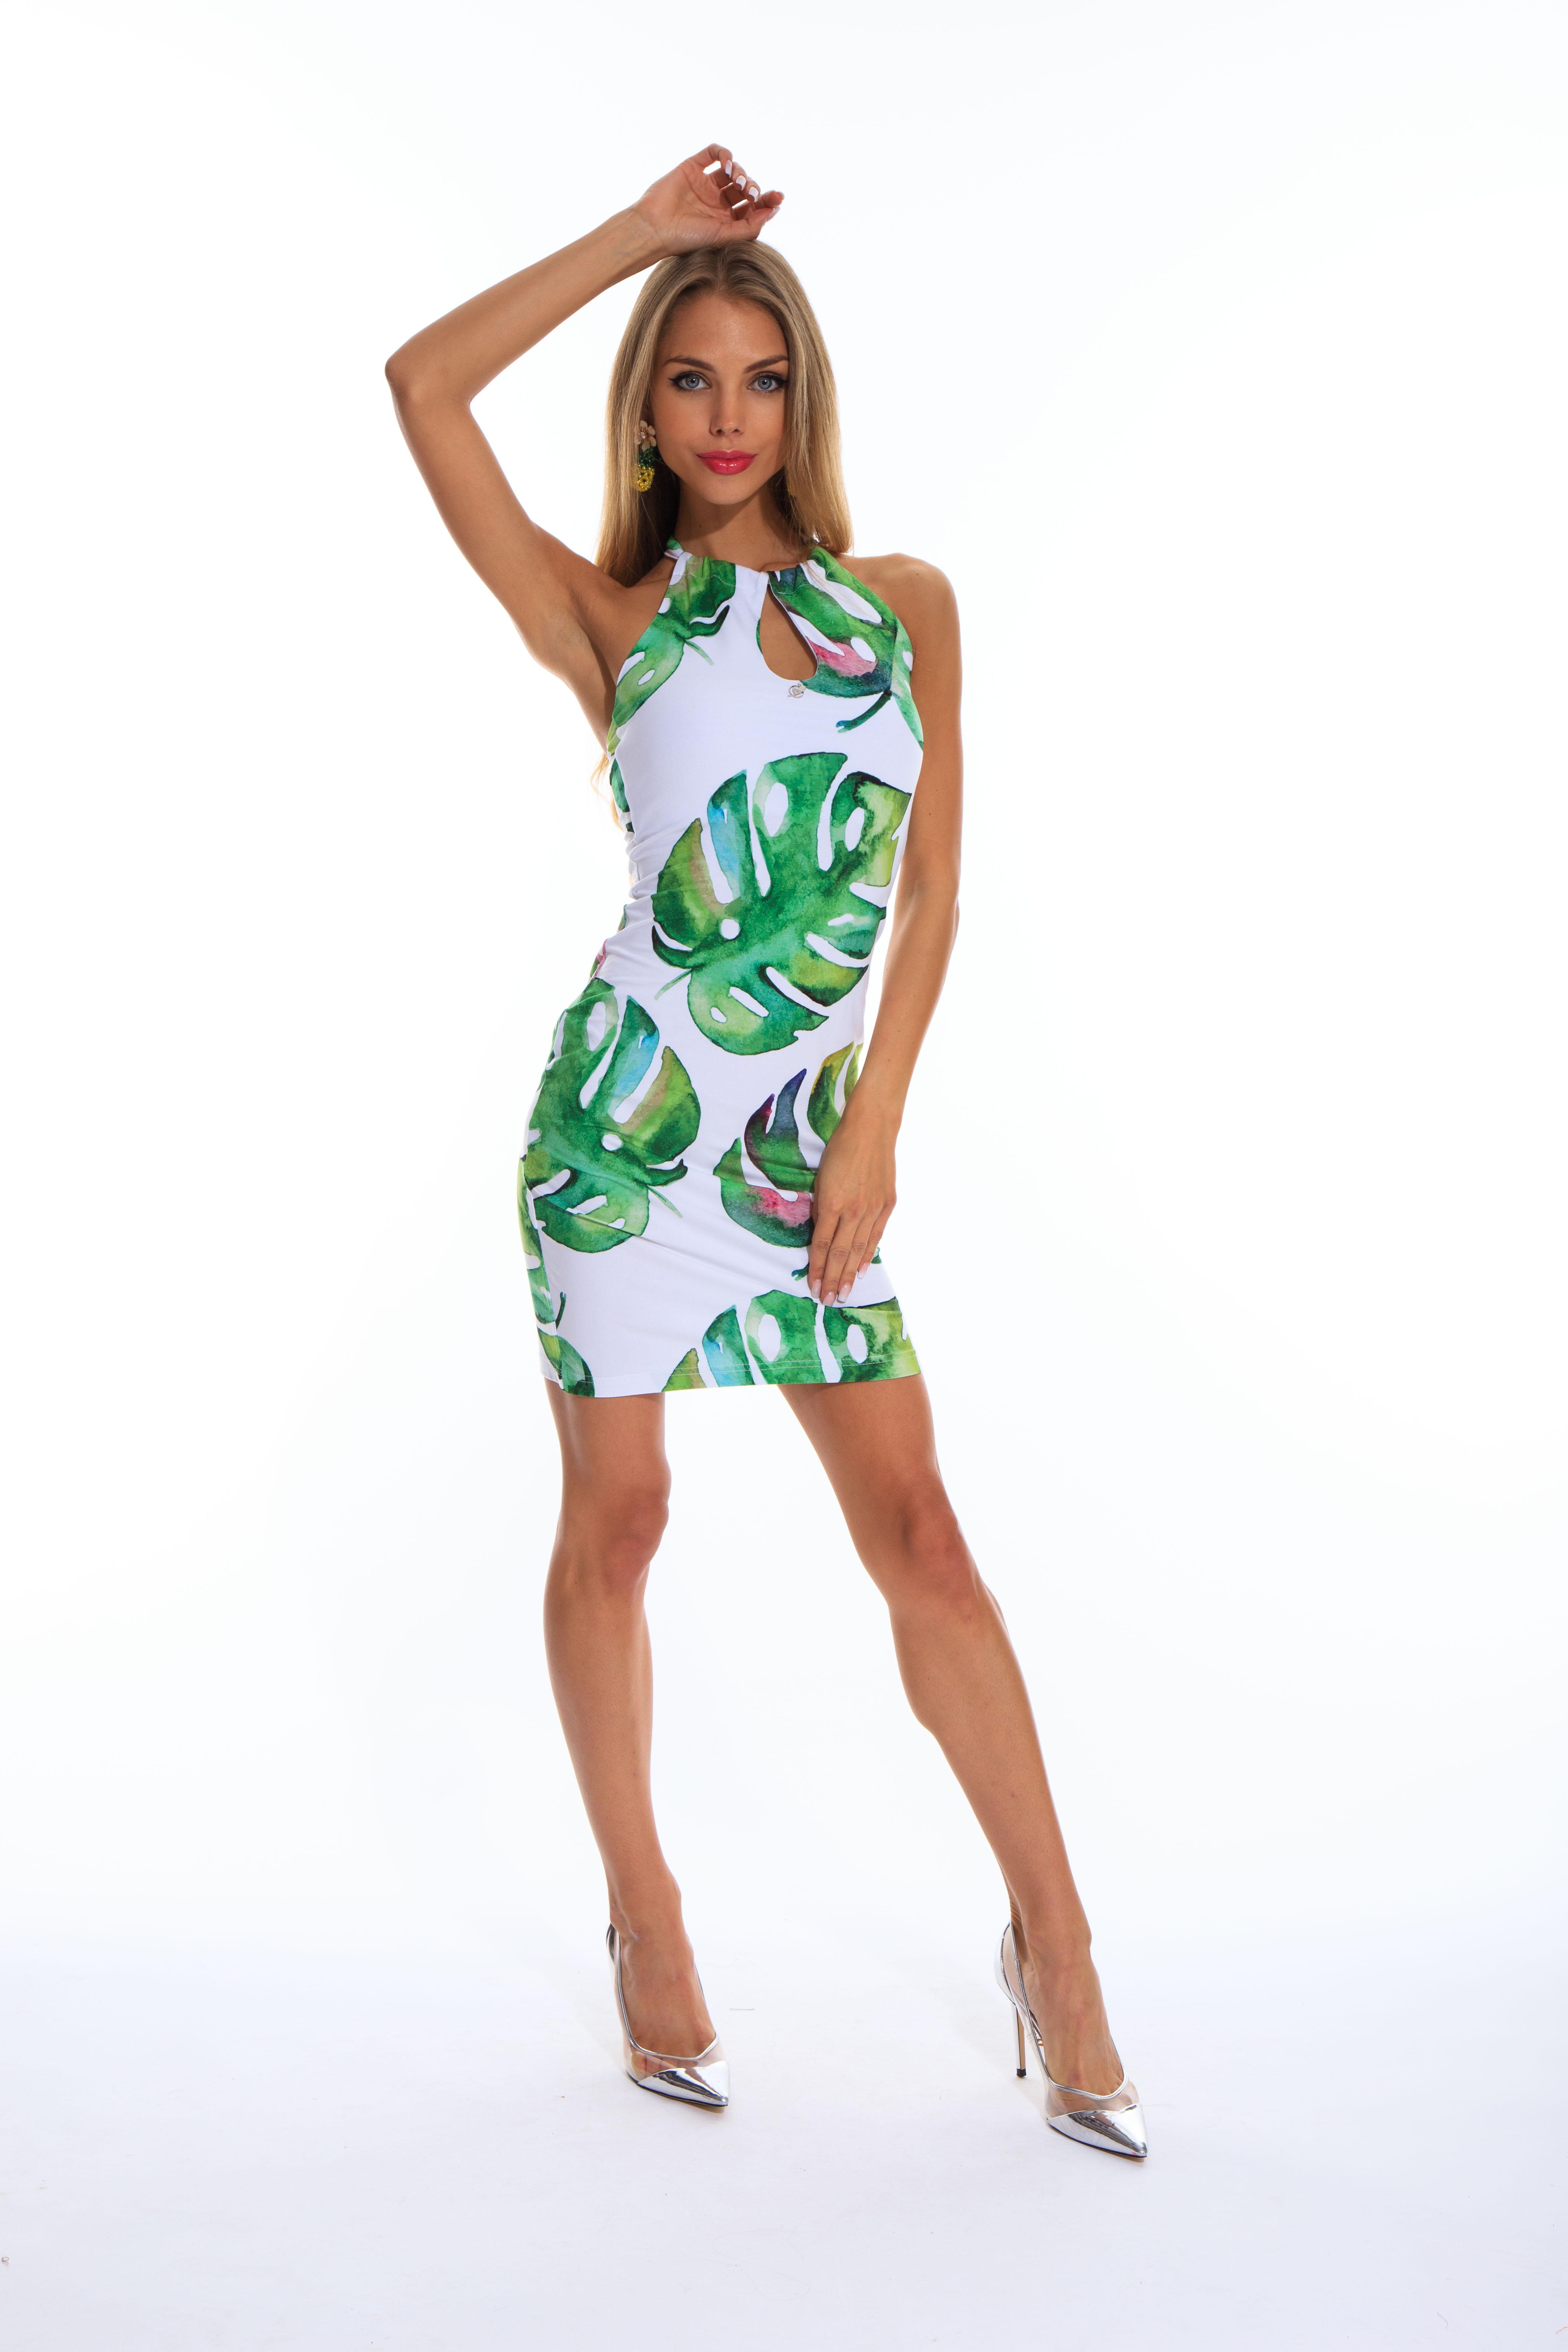 Akciós | Mayo Chix női ruha AGE | Markasbolt.hu Hivatalos